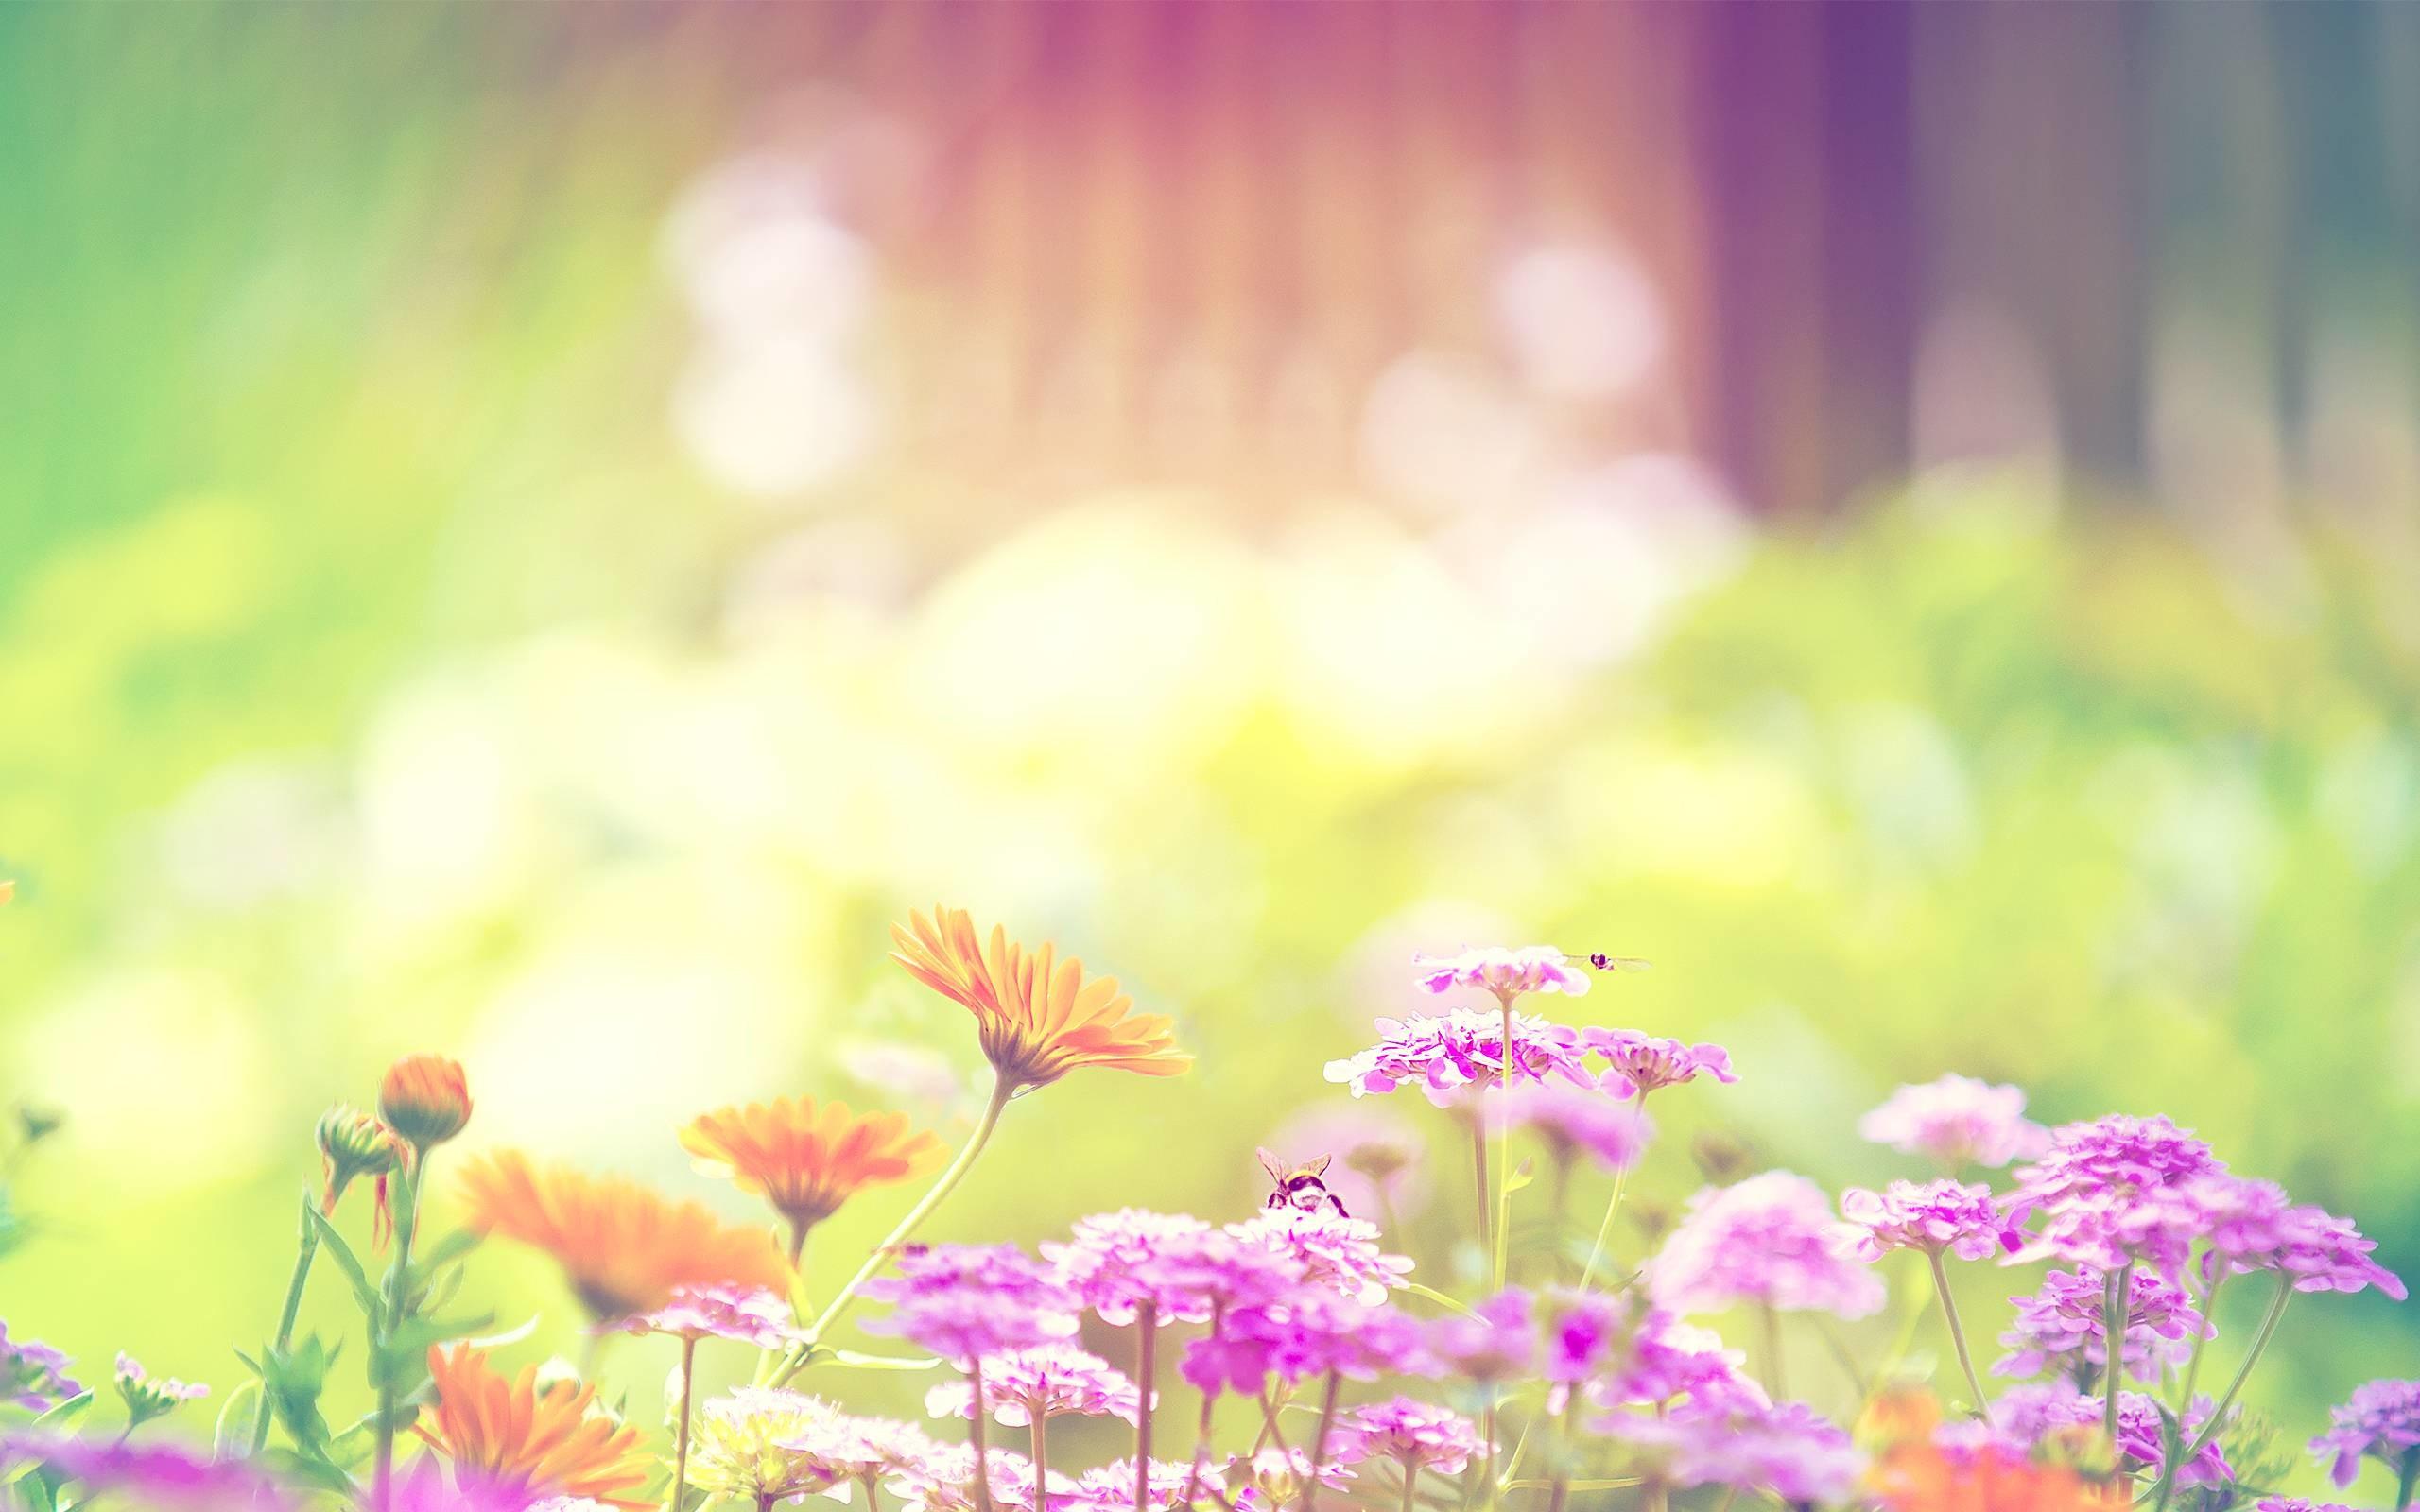 Trendy Desktop Spring Flowers Hd Wallpaper 2560x1600PX ~ Colorful .